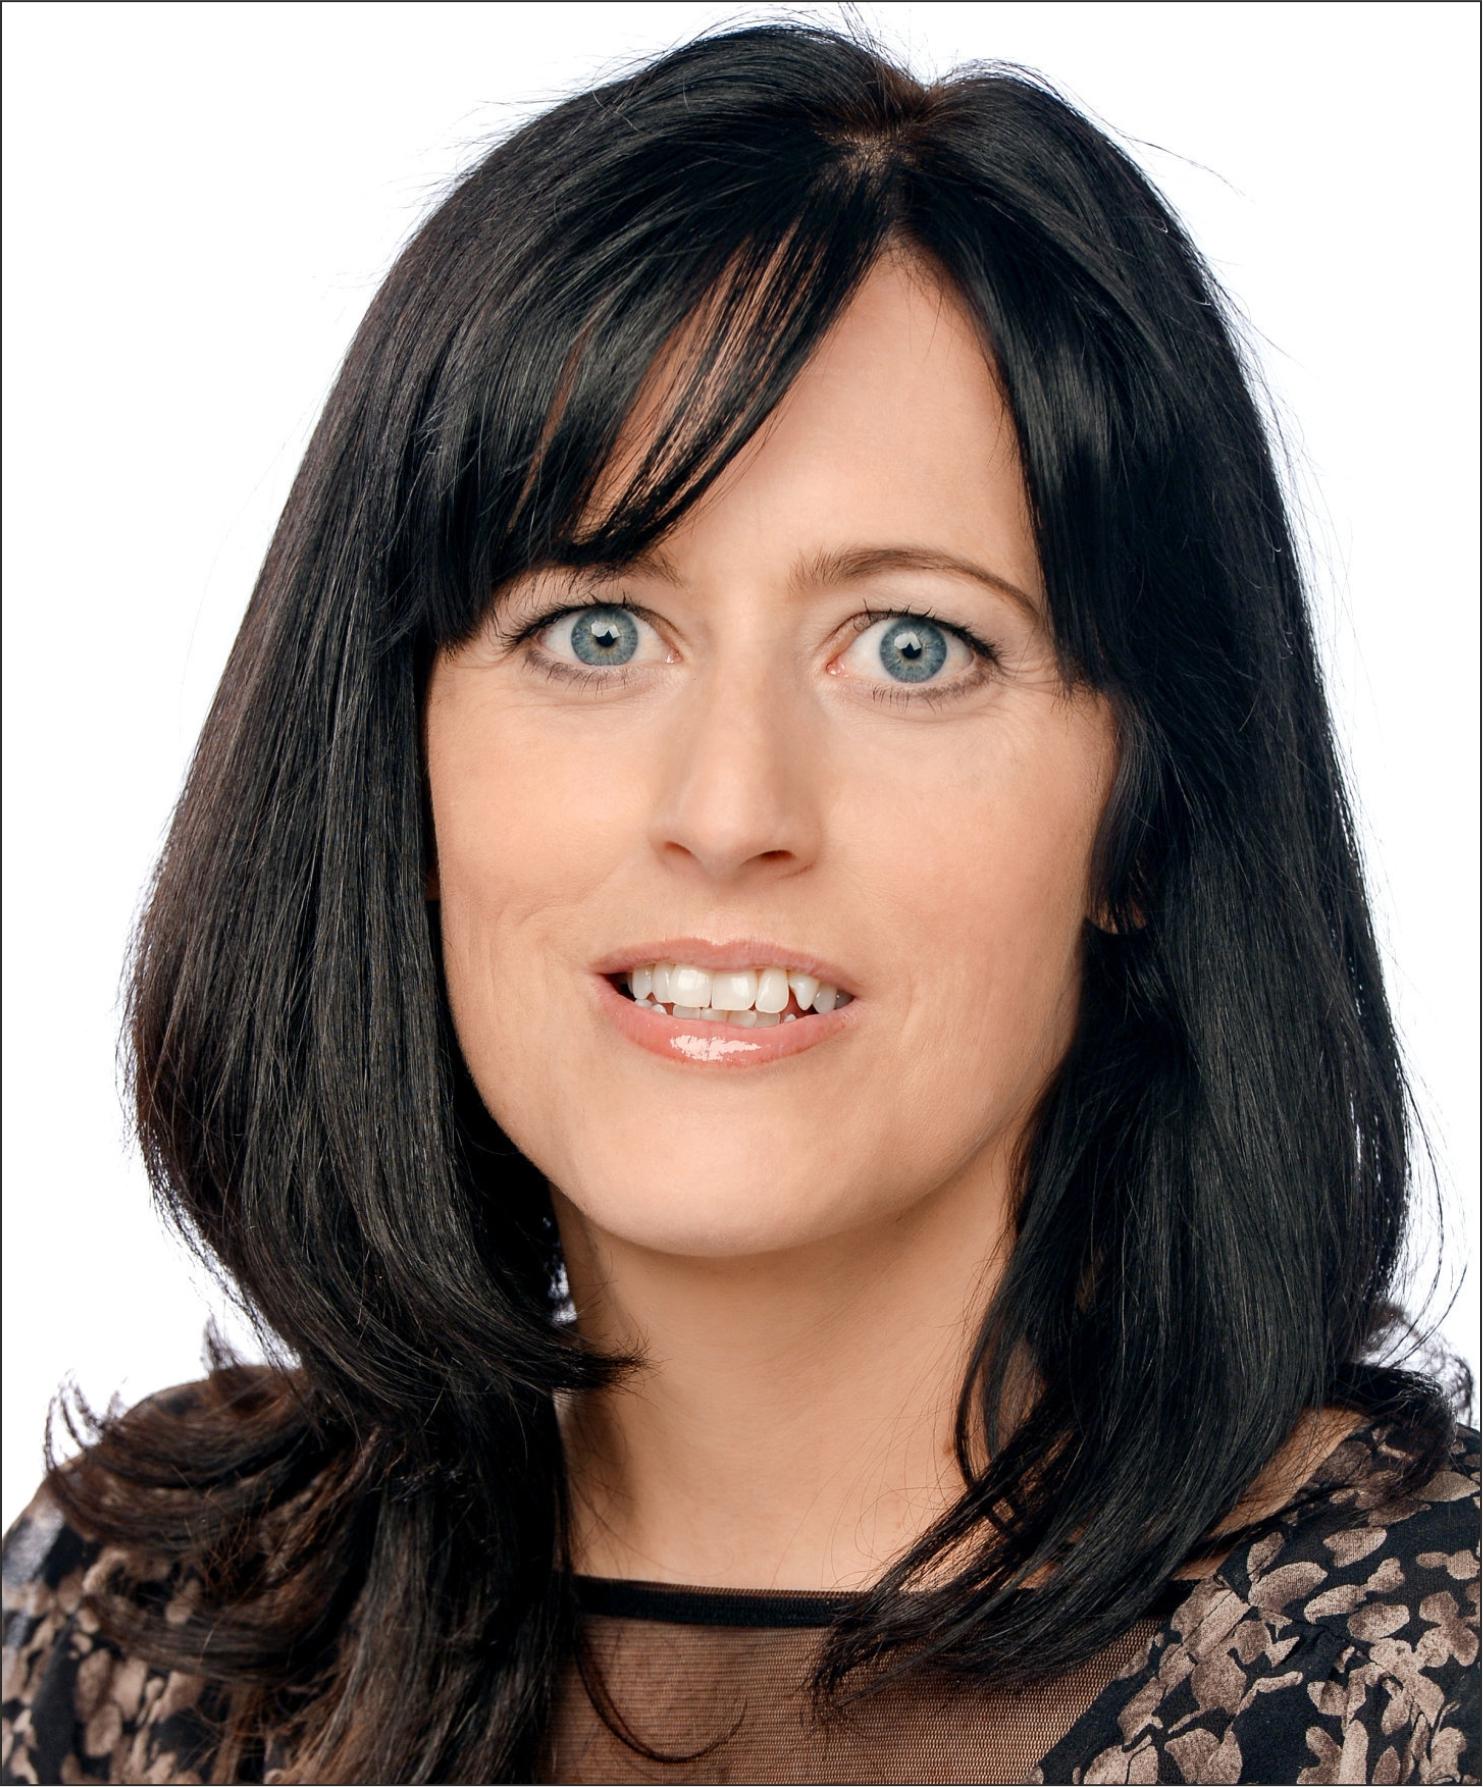 Bettina Prendergast